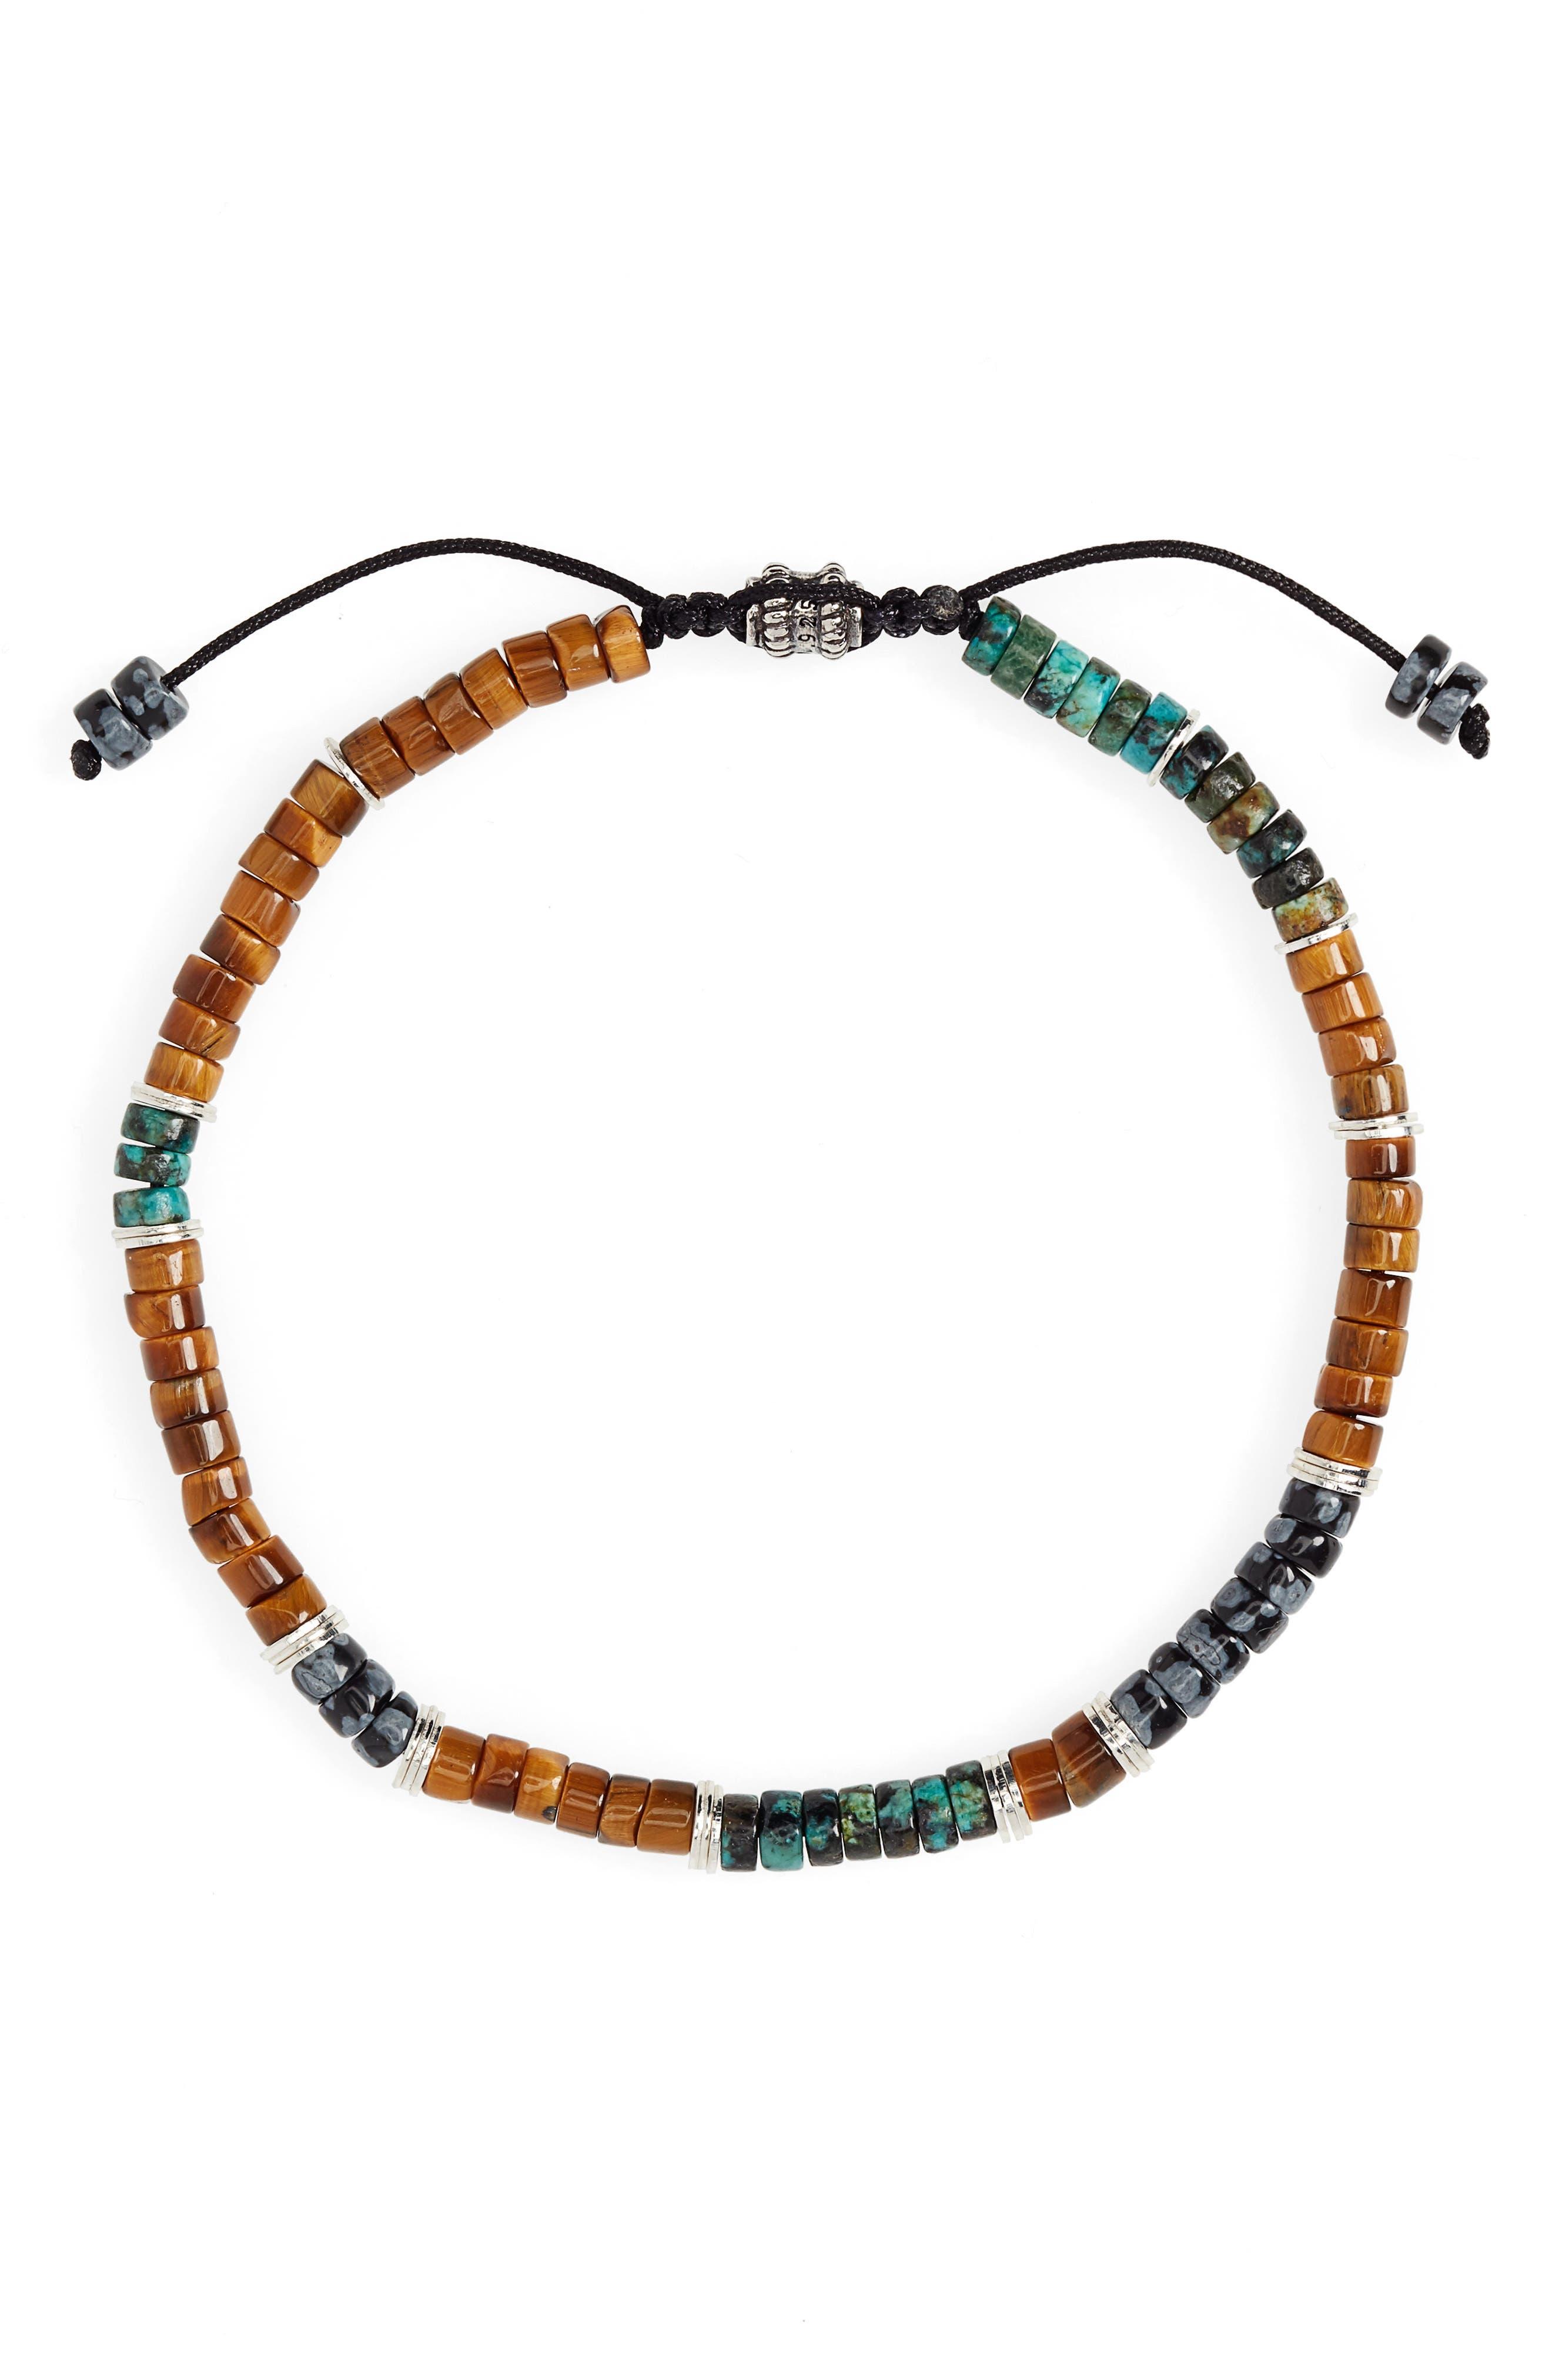 JONAS STUDIO Stone Bead Bracelet in Gold